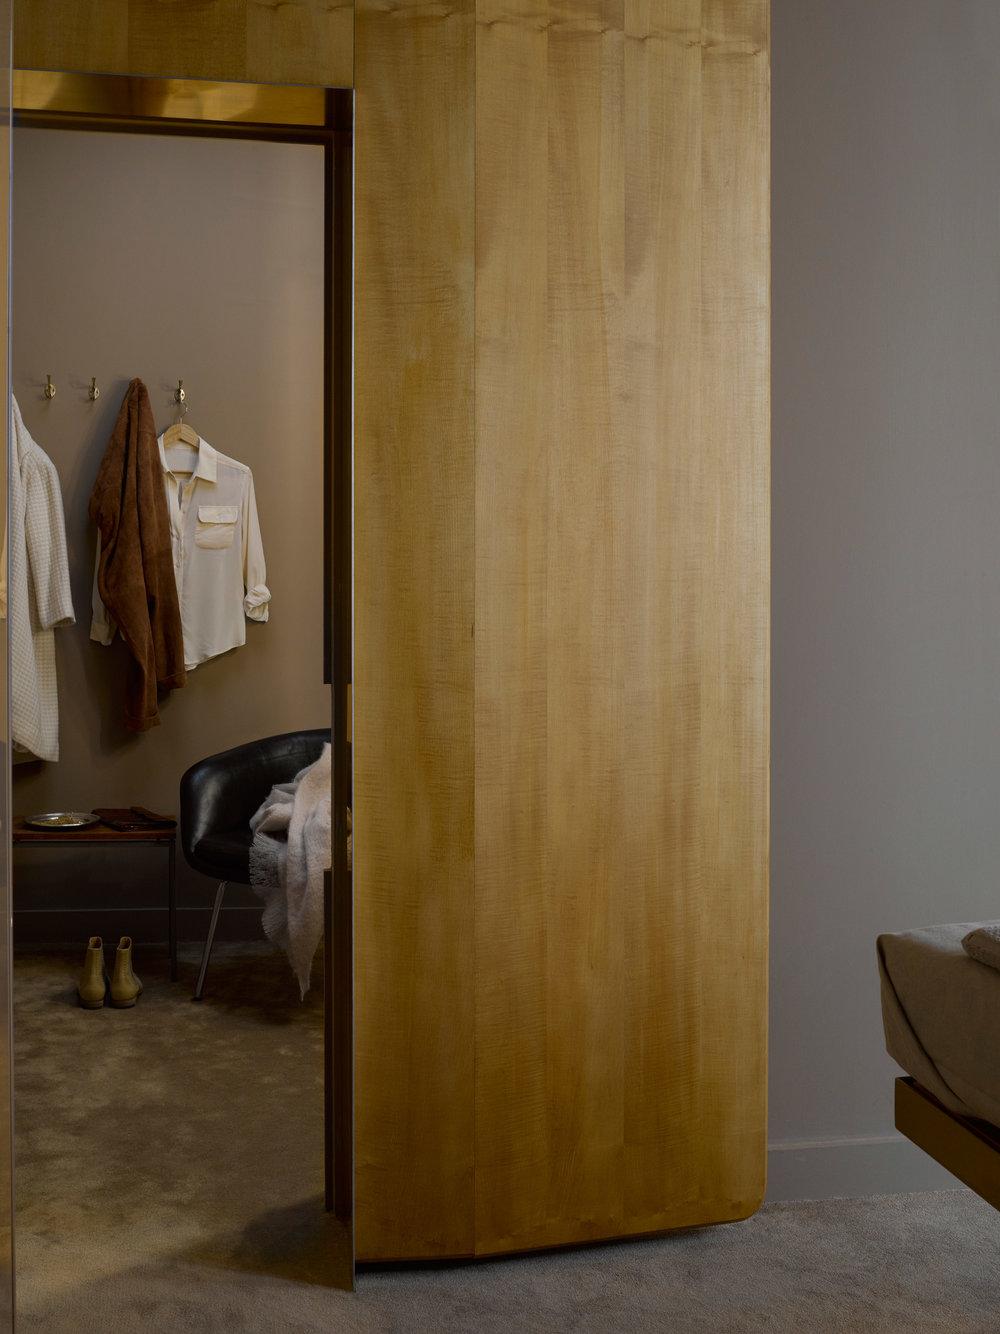 aesop-paulin-paulin-paulin-pop-up-paris-interiors-retail-shops_dezeen_2364_col_12.jpg